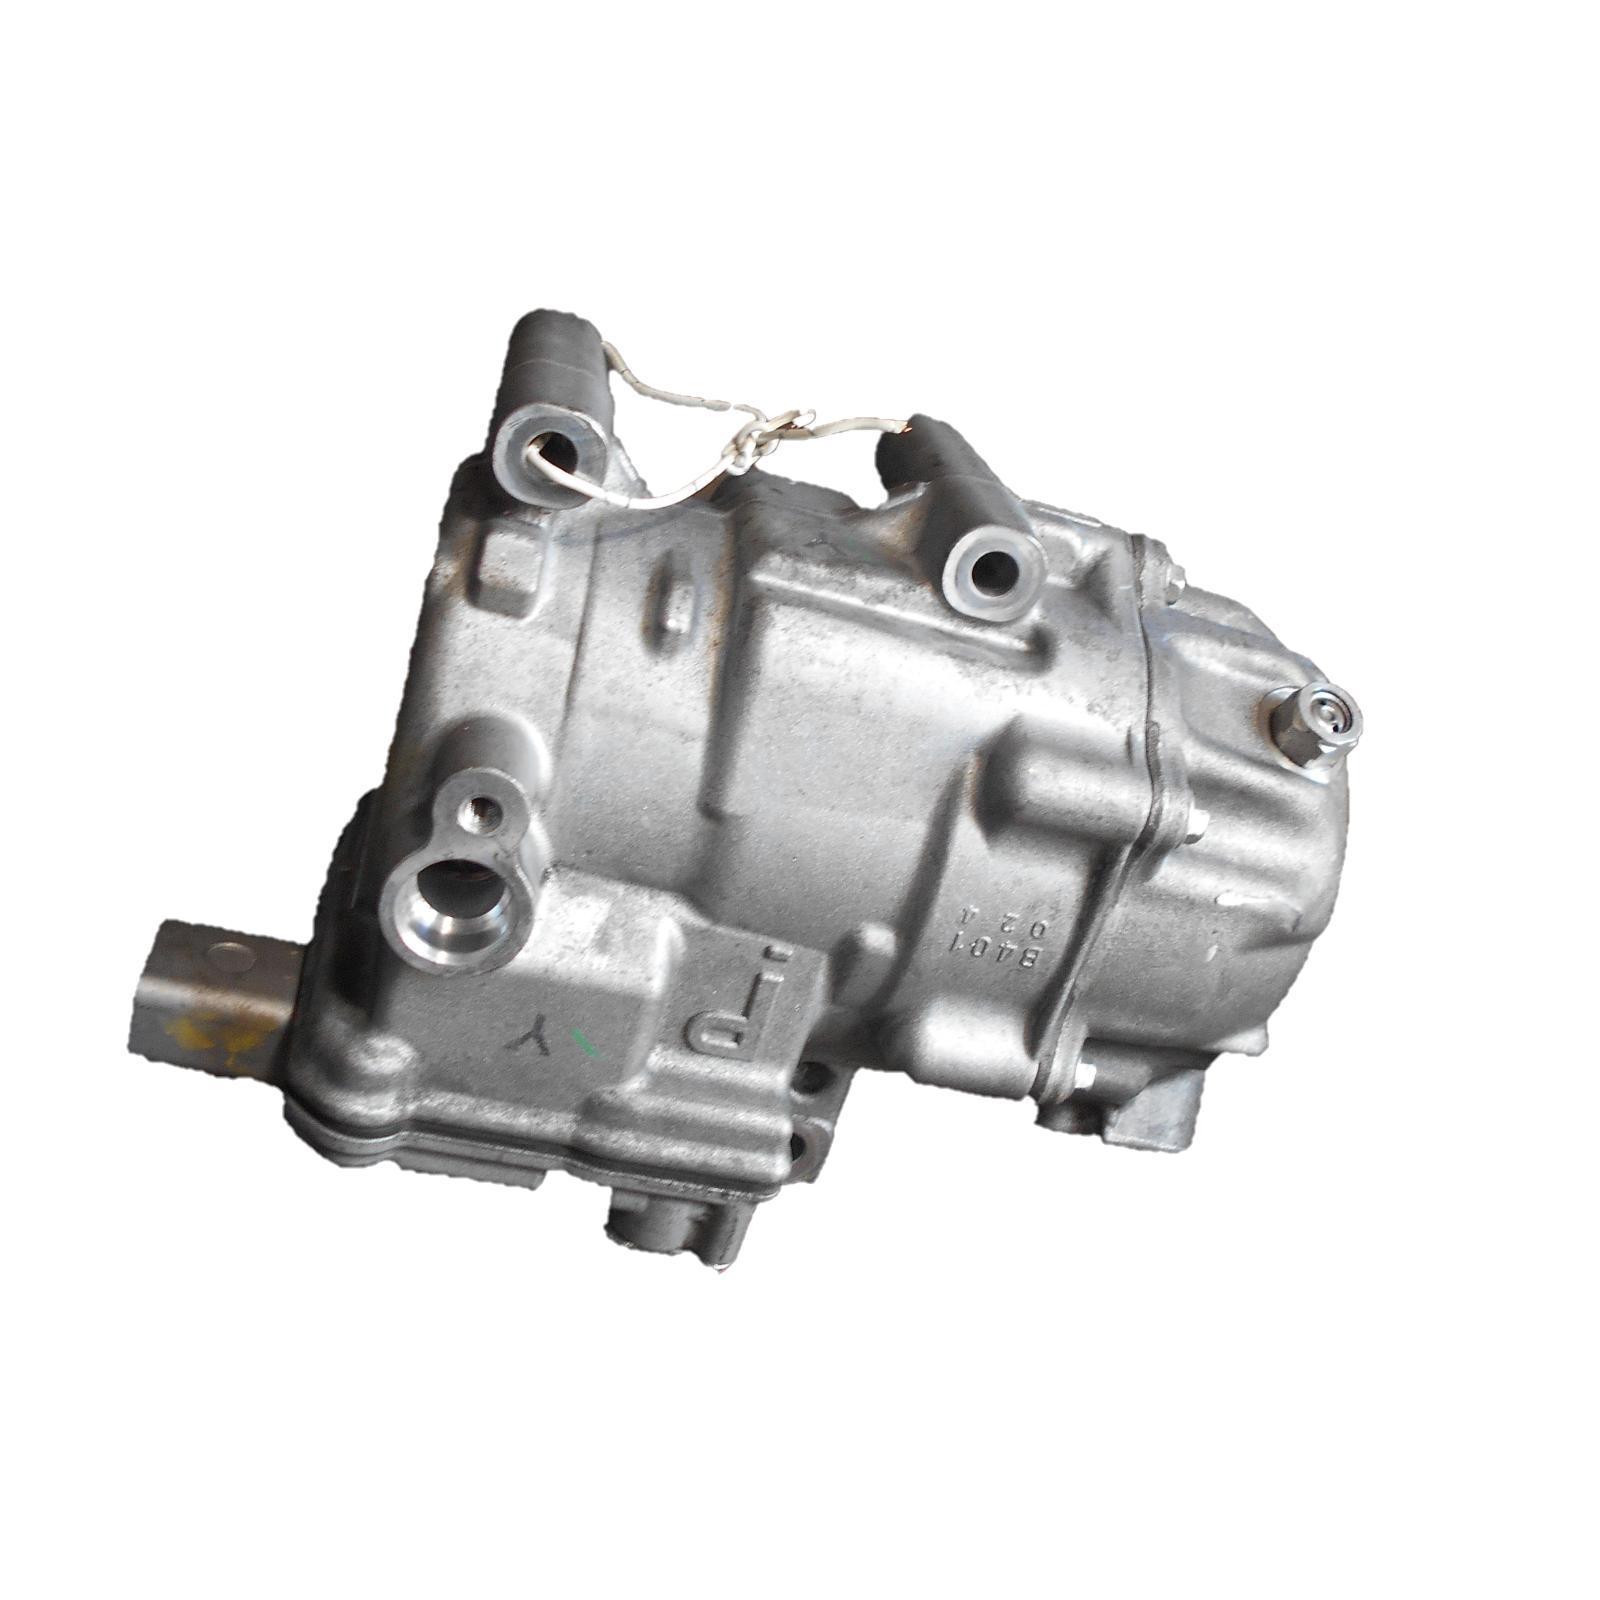 TOYOTA PRIUS, A/C Compressor, ZVW30R, 07/09-12/15